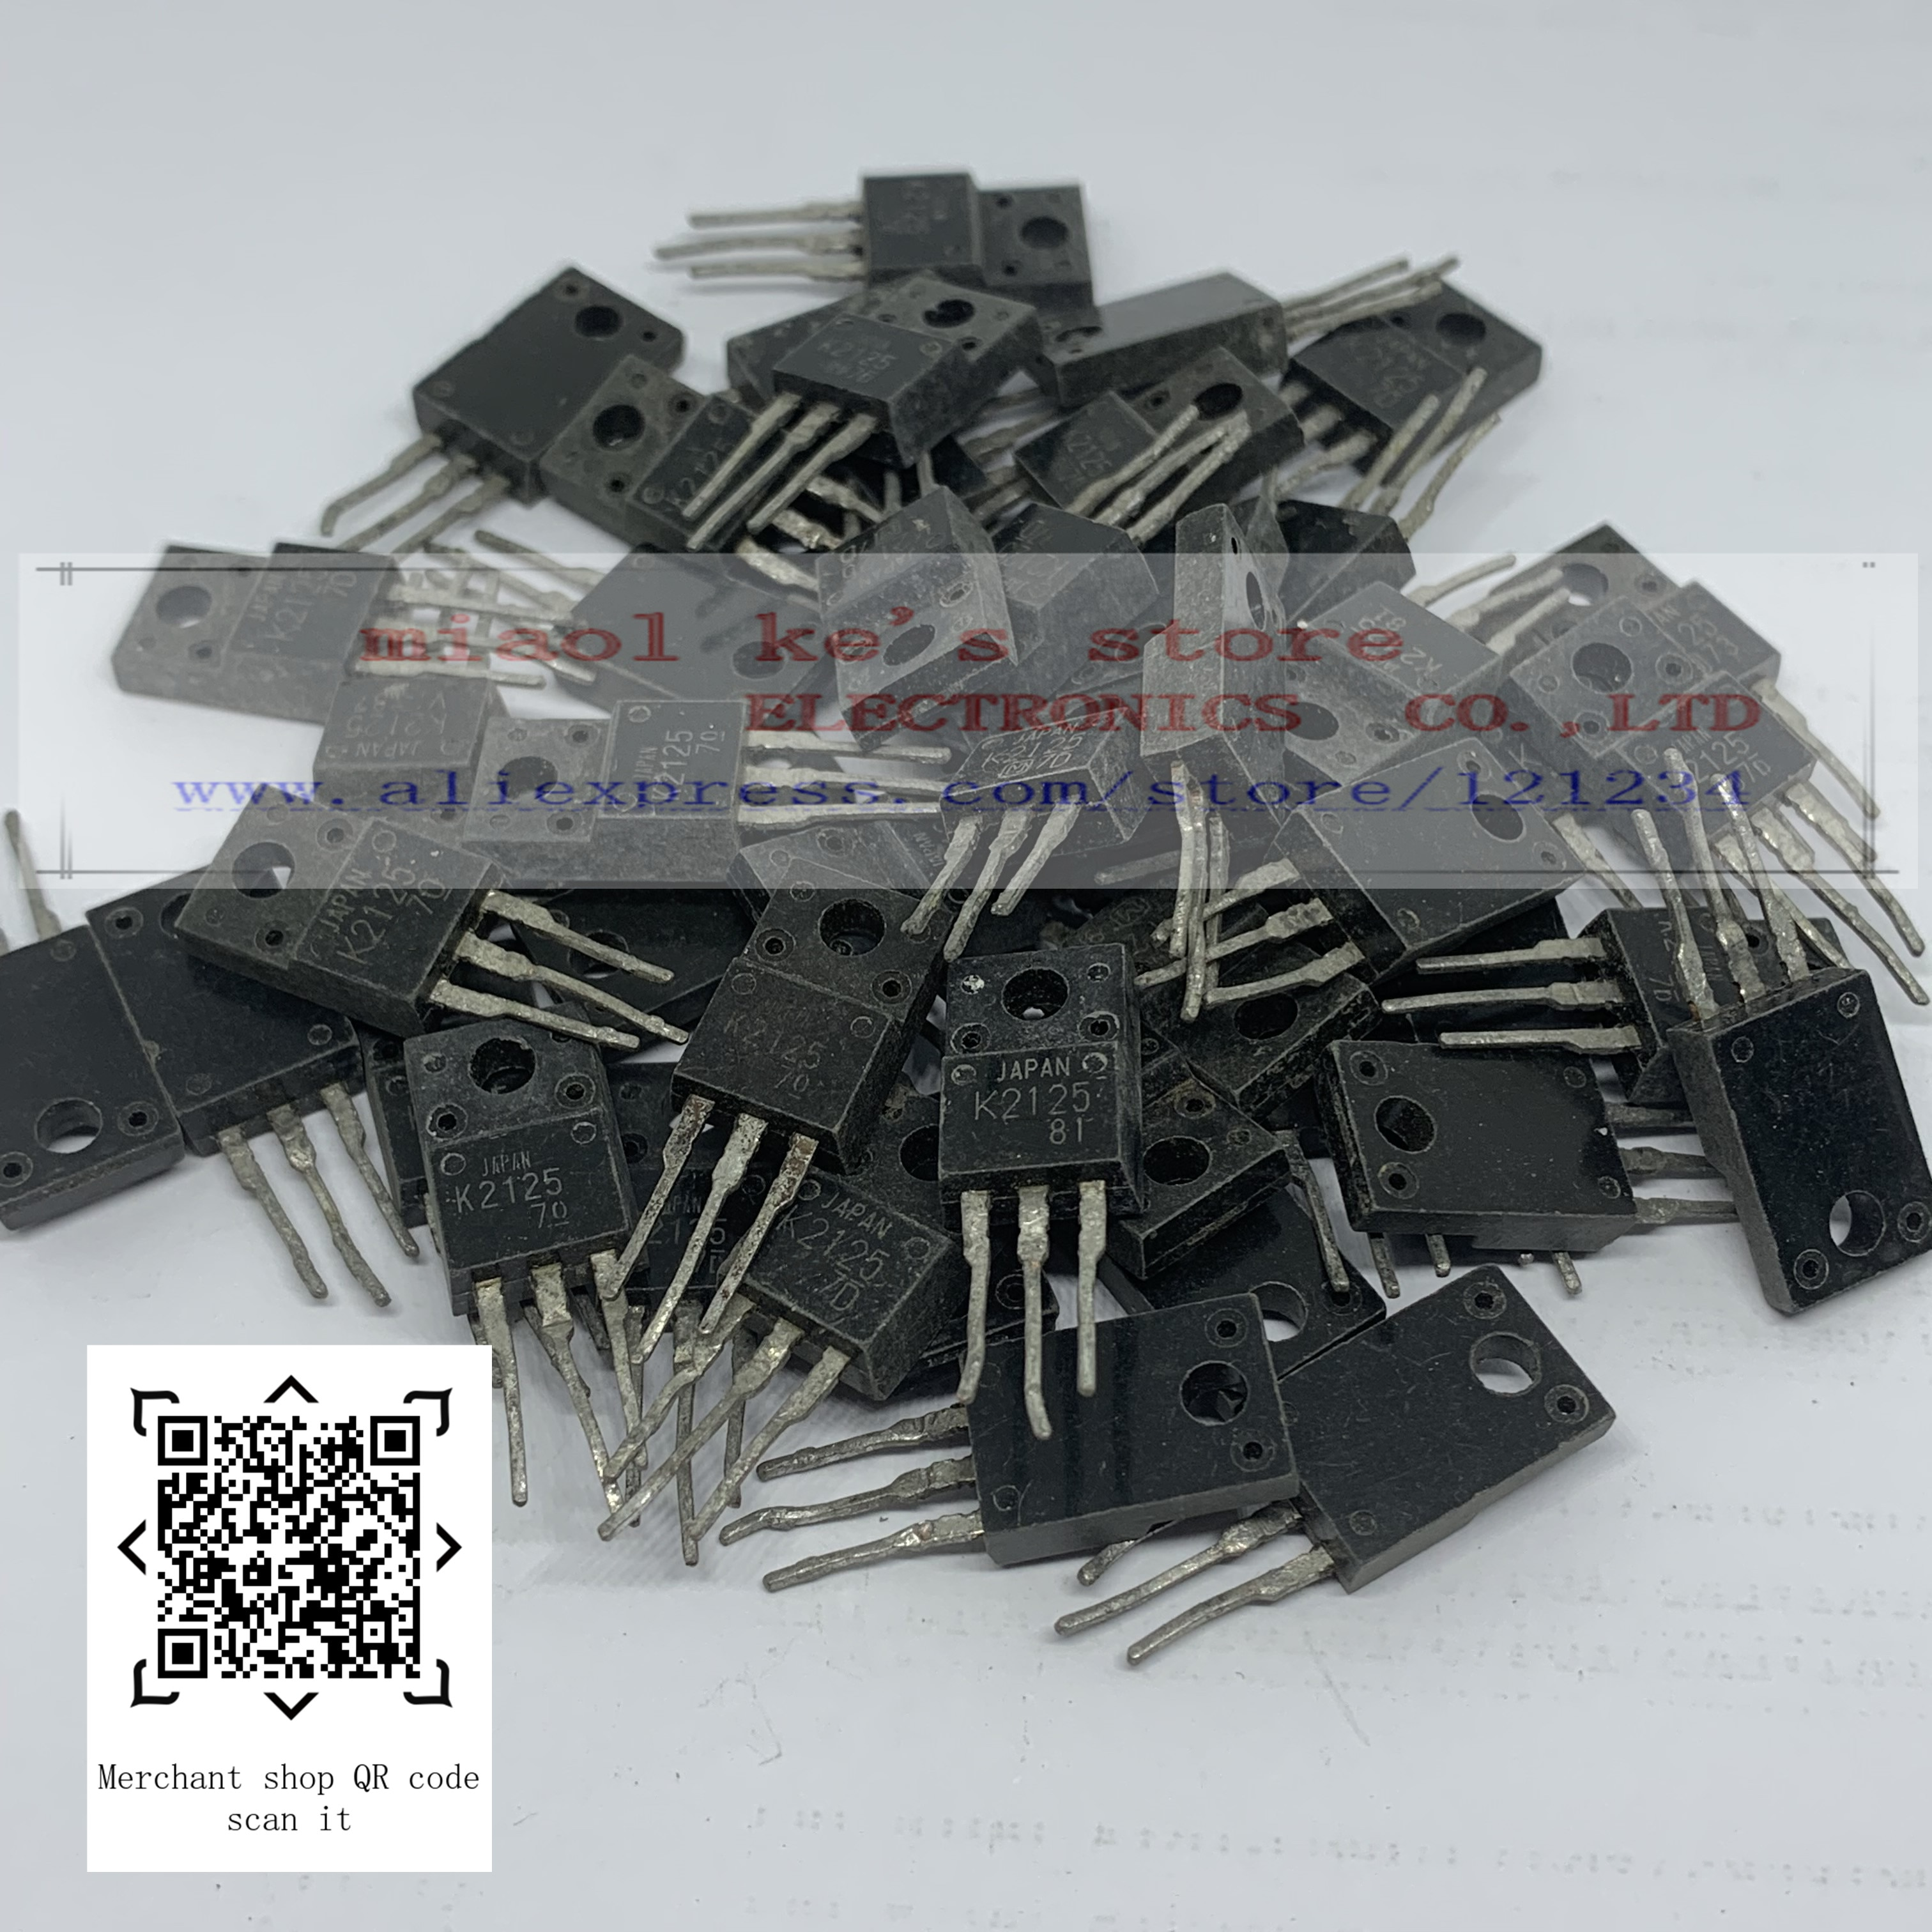 [10 sztuk] towary używane; 2SK2101 2SK2125 2SK2127 2SK2128 2SK2129 2SK2130 2SK2133 2SK2138 2SK2139 2SK2142